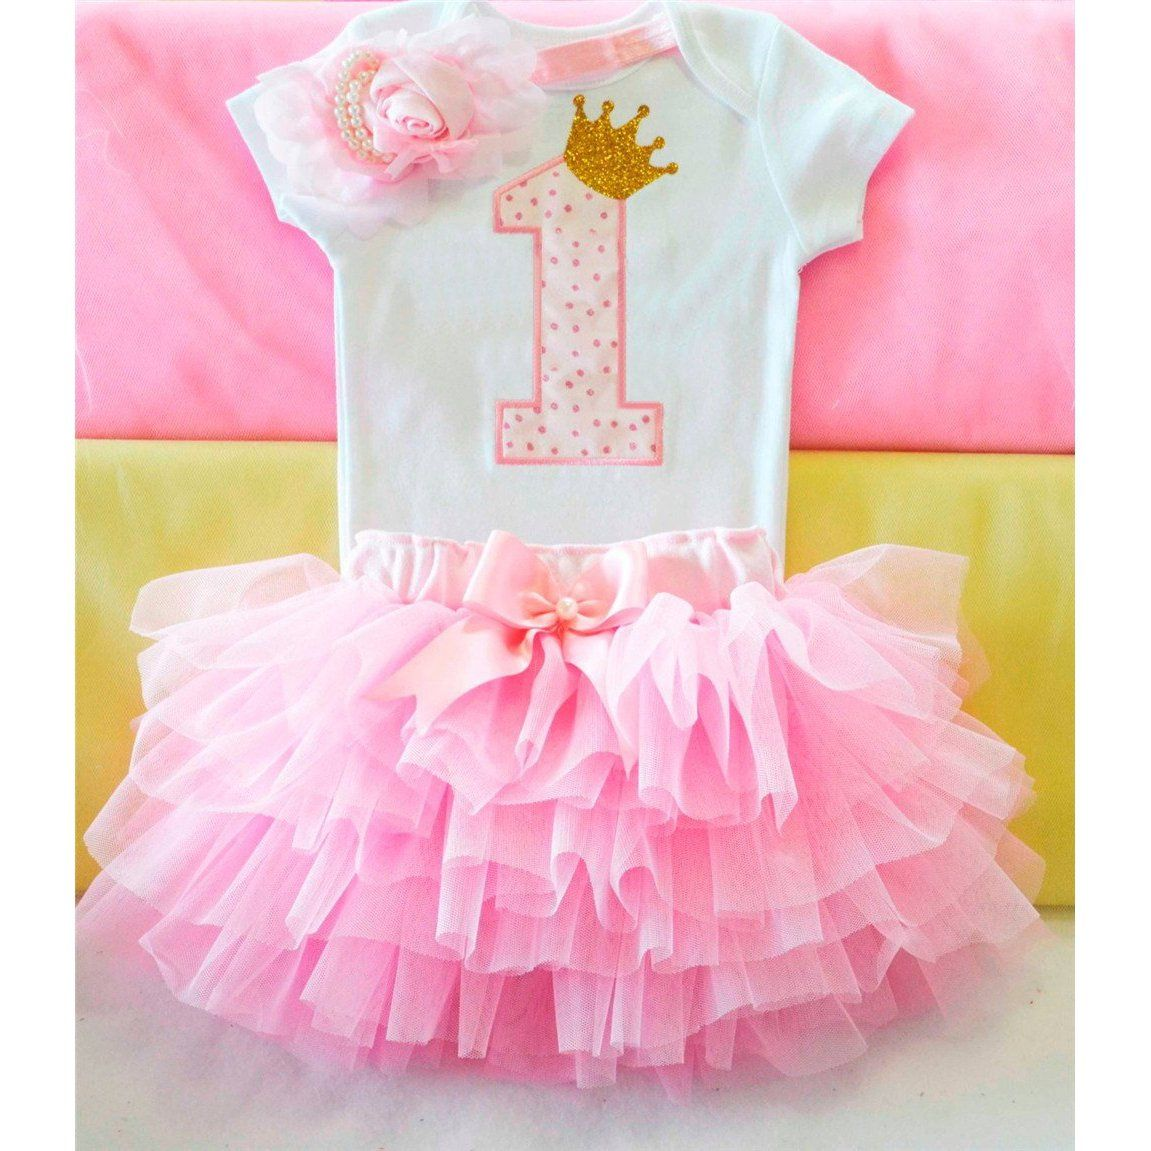 Baby girls 1st birthday tutu outfits in 2019 baby girl